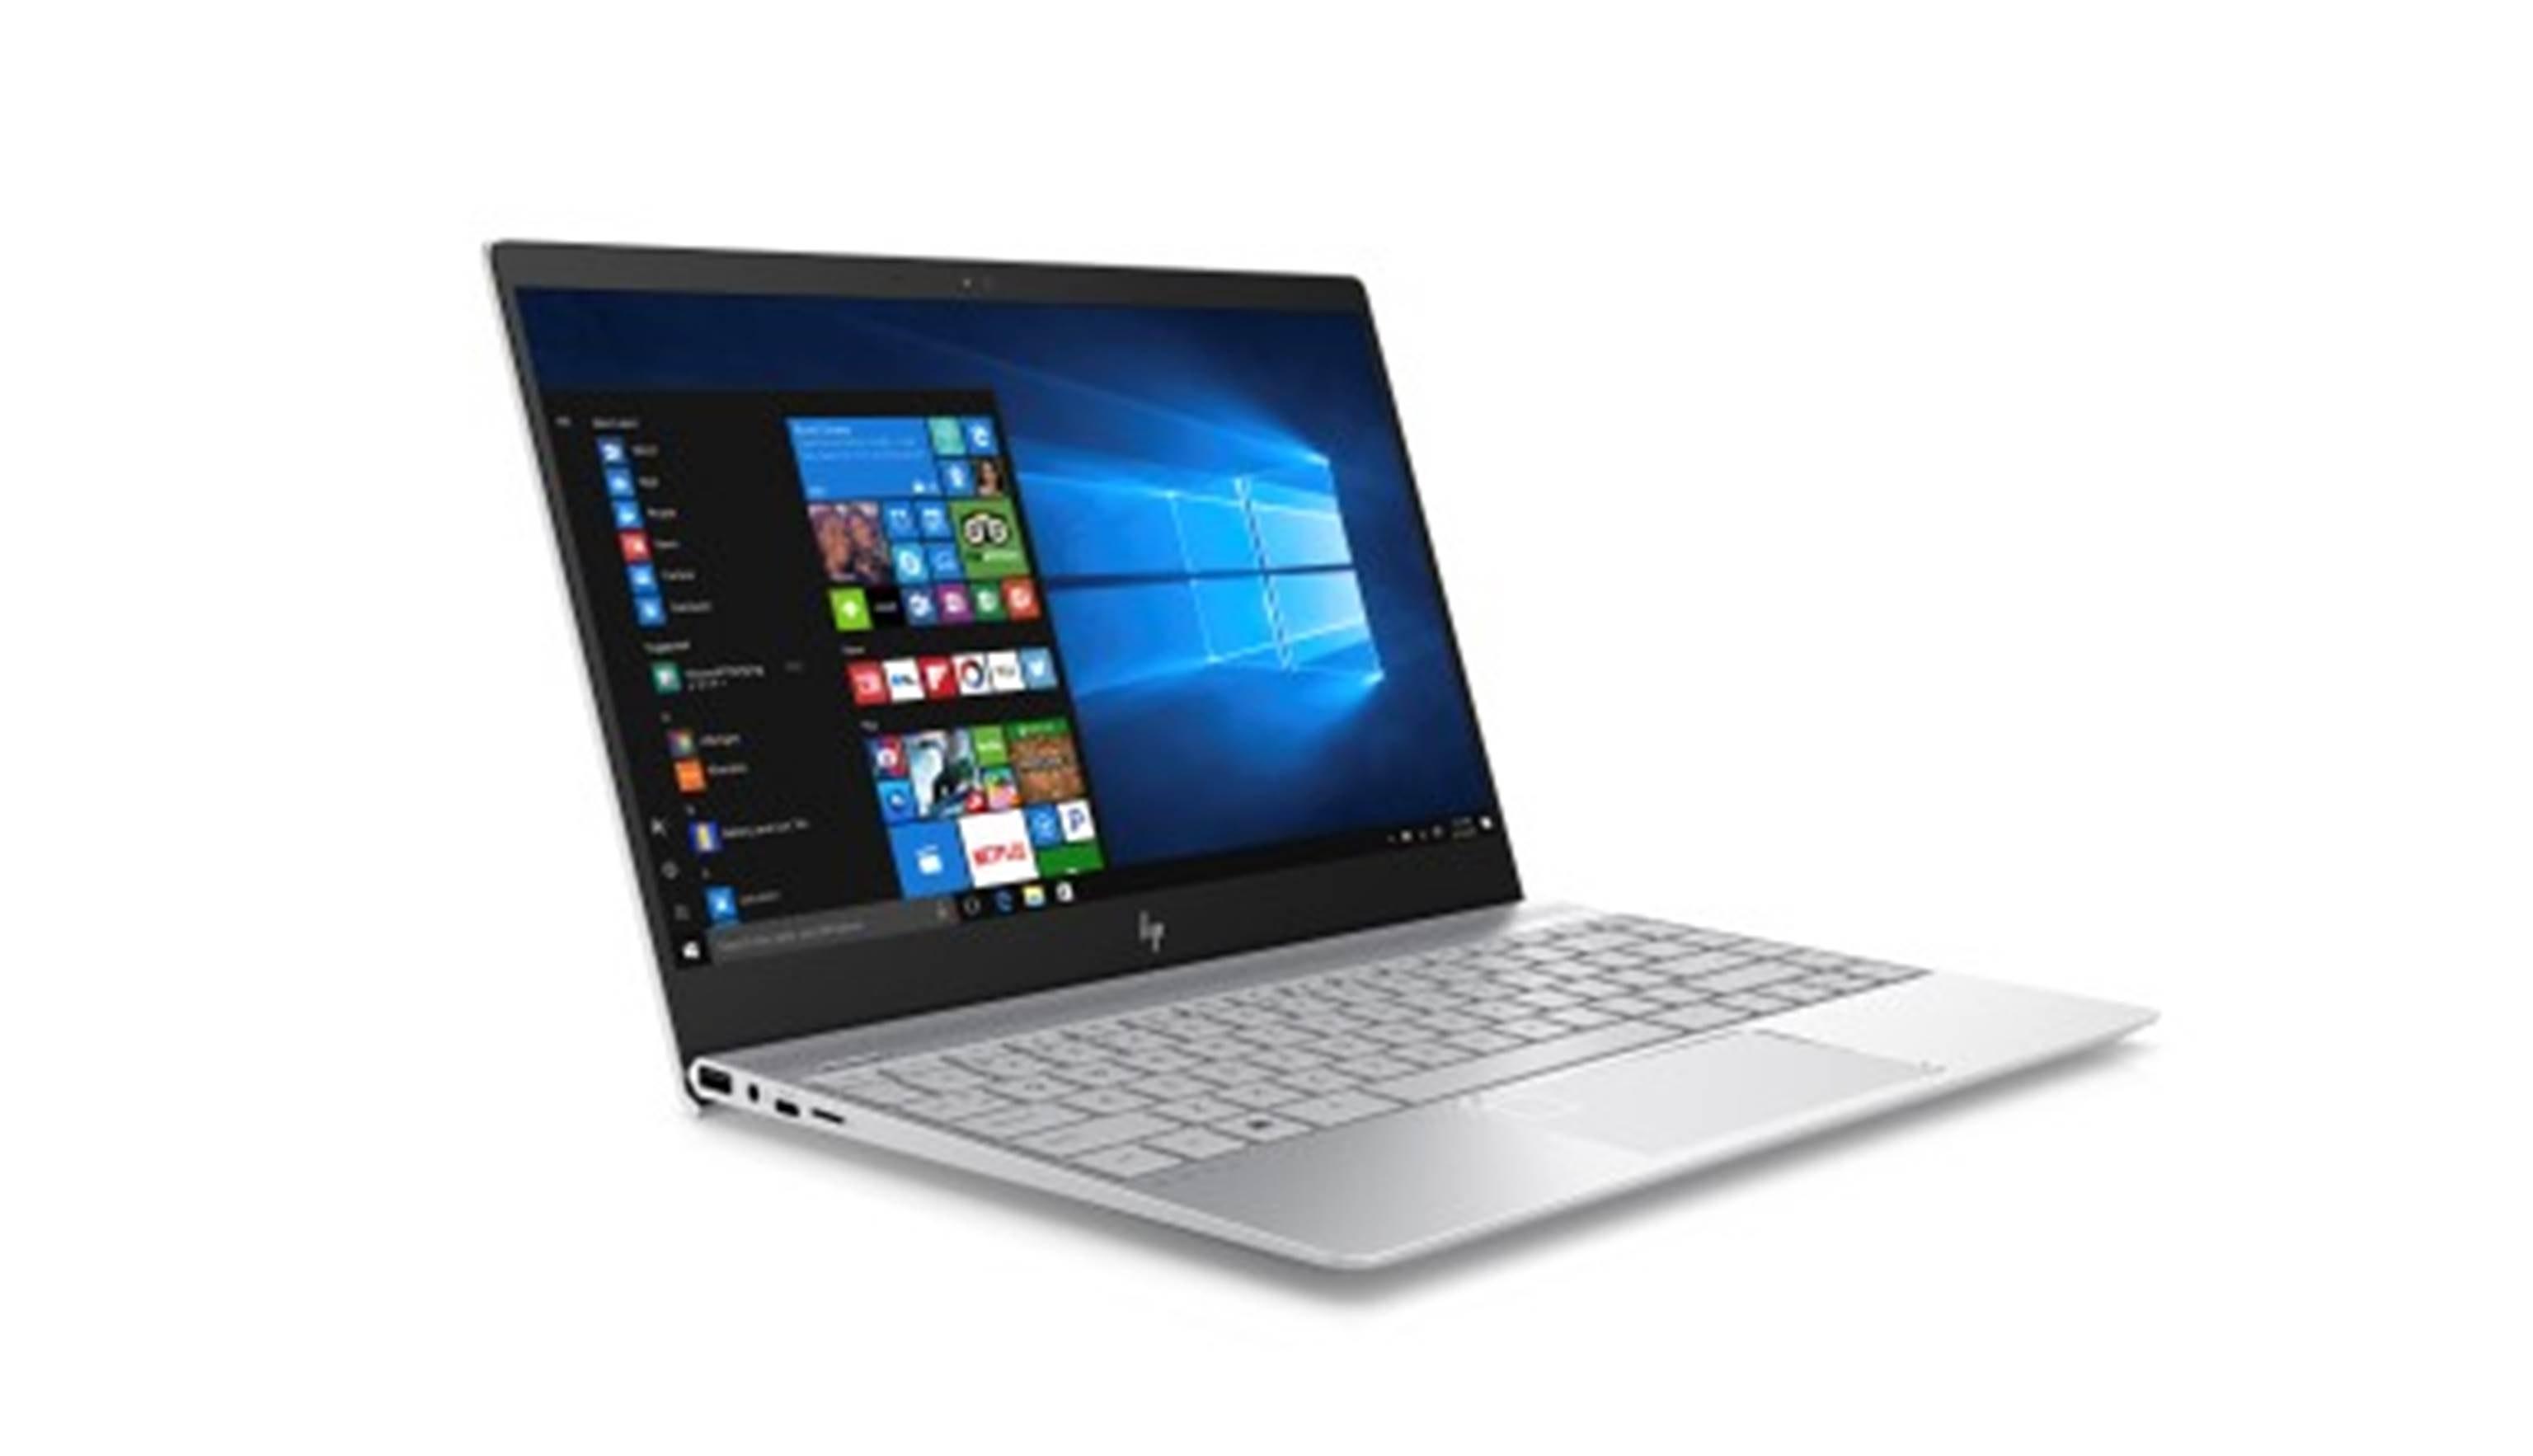 HP Envy AD115TU 2SL96PA 13 i5 - Silver (2)